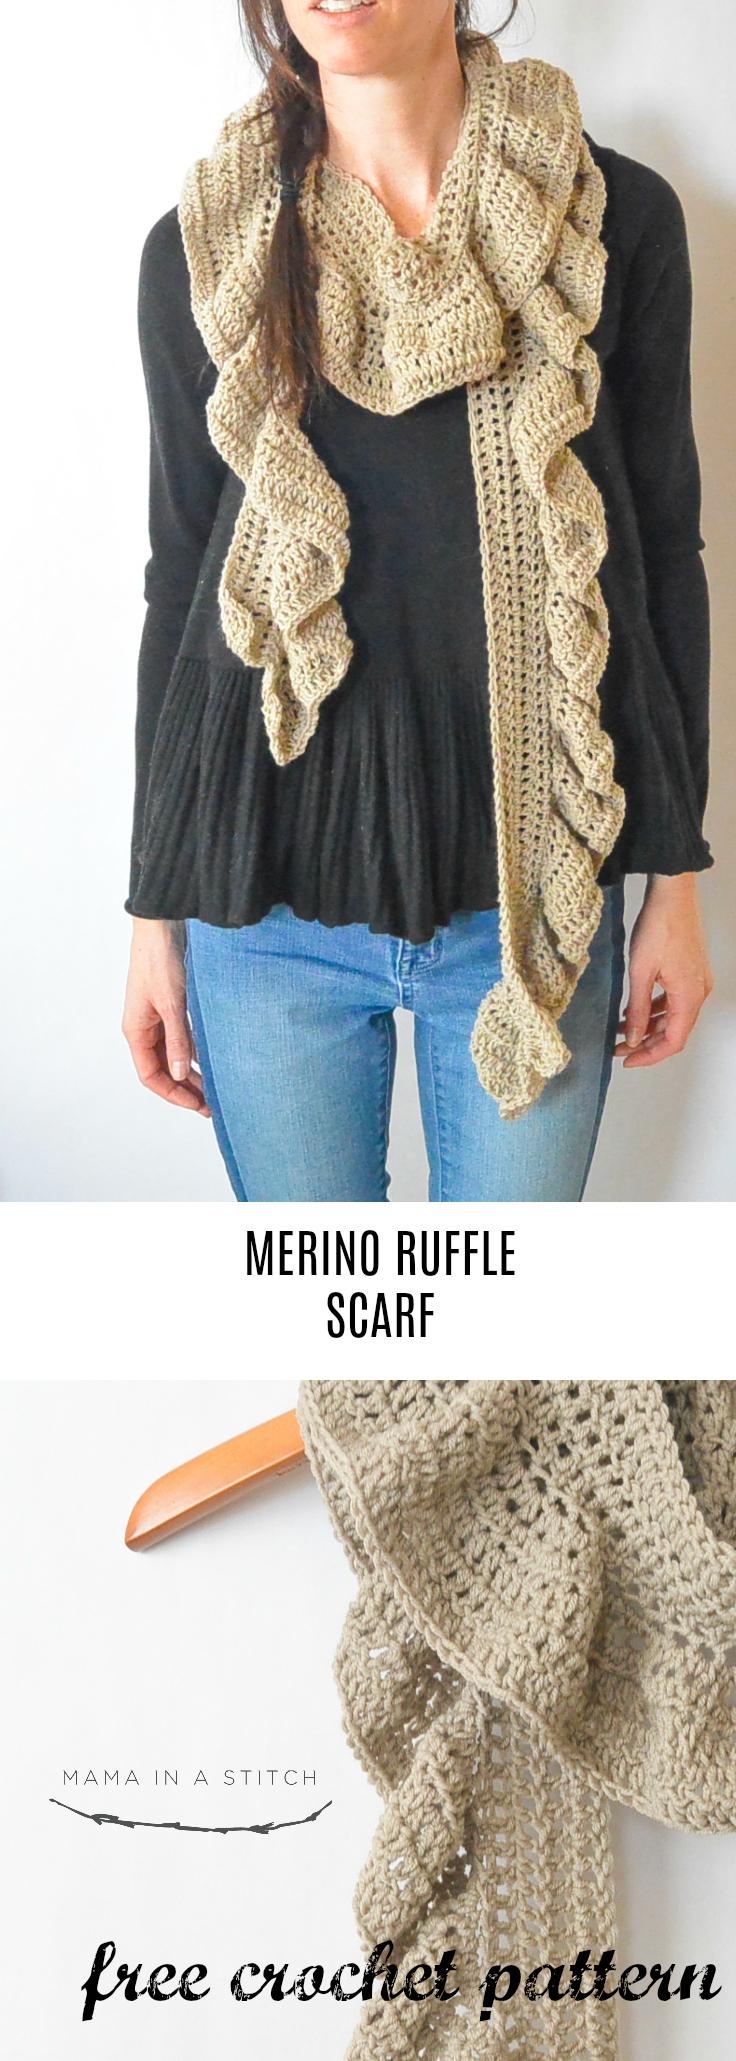 Merino Crocheted Ruffle Scarf Pattern Mama In A Stitch